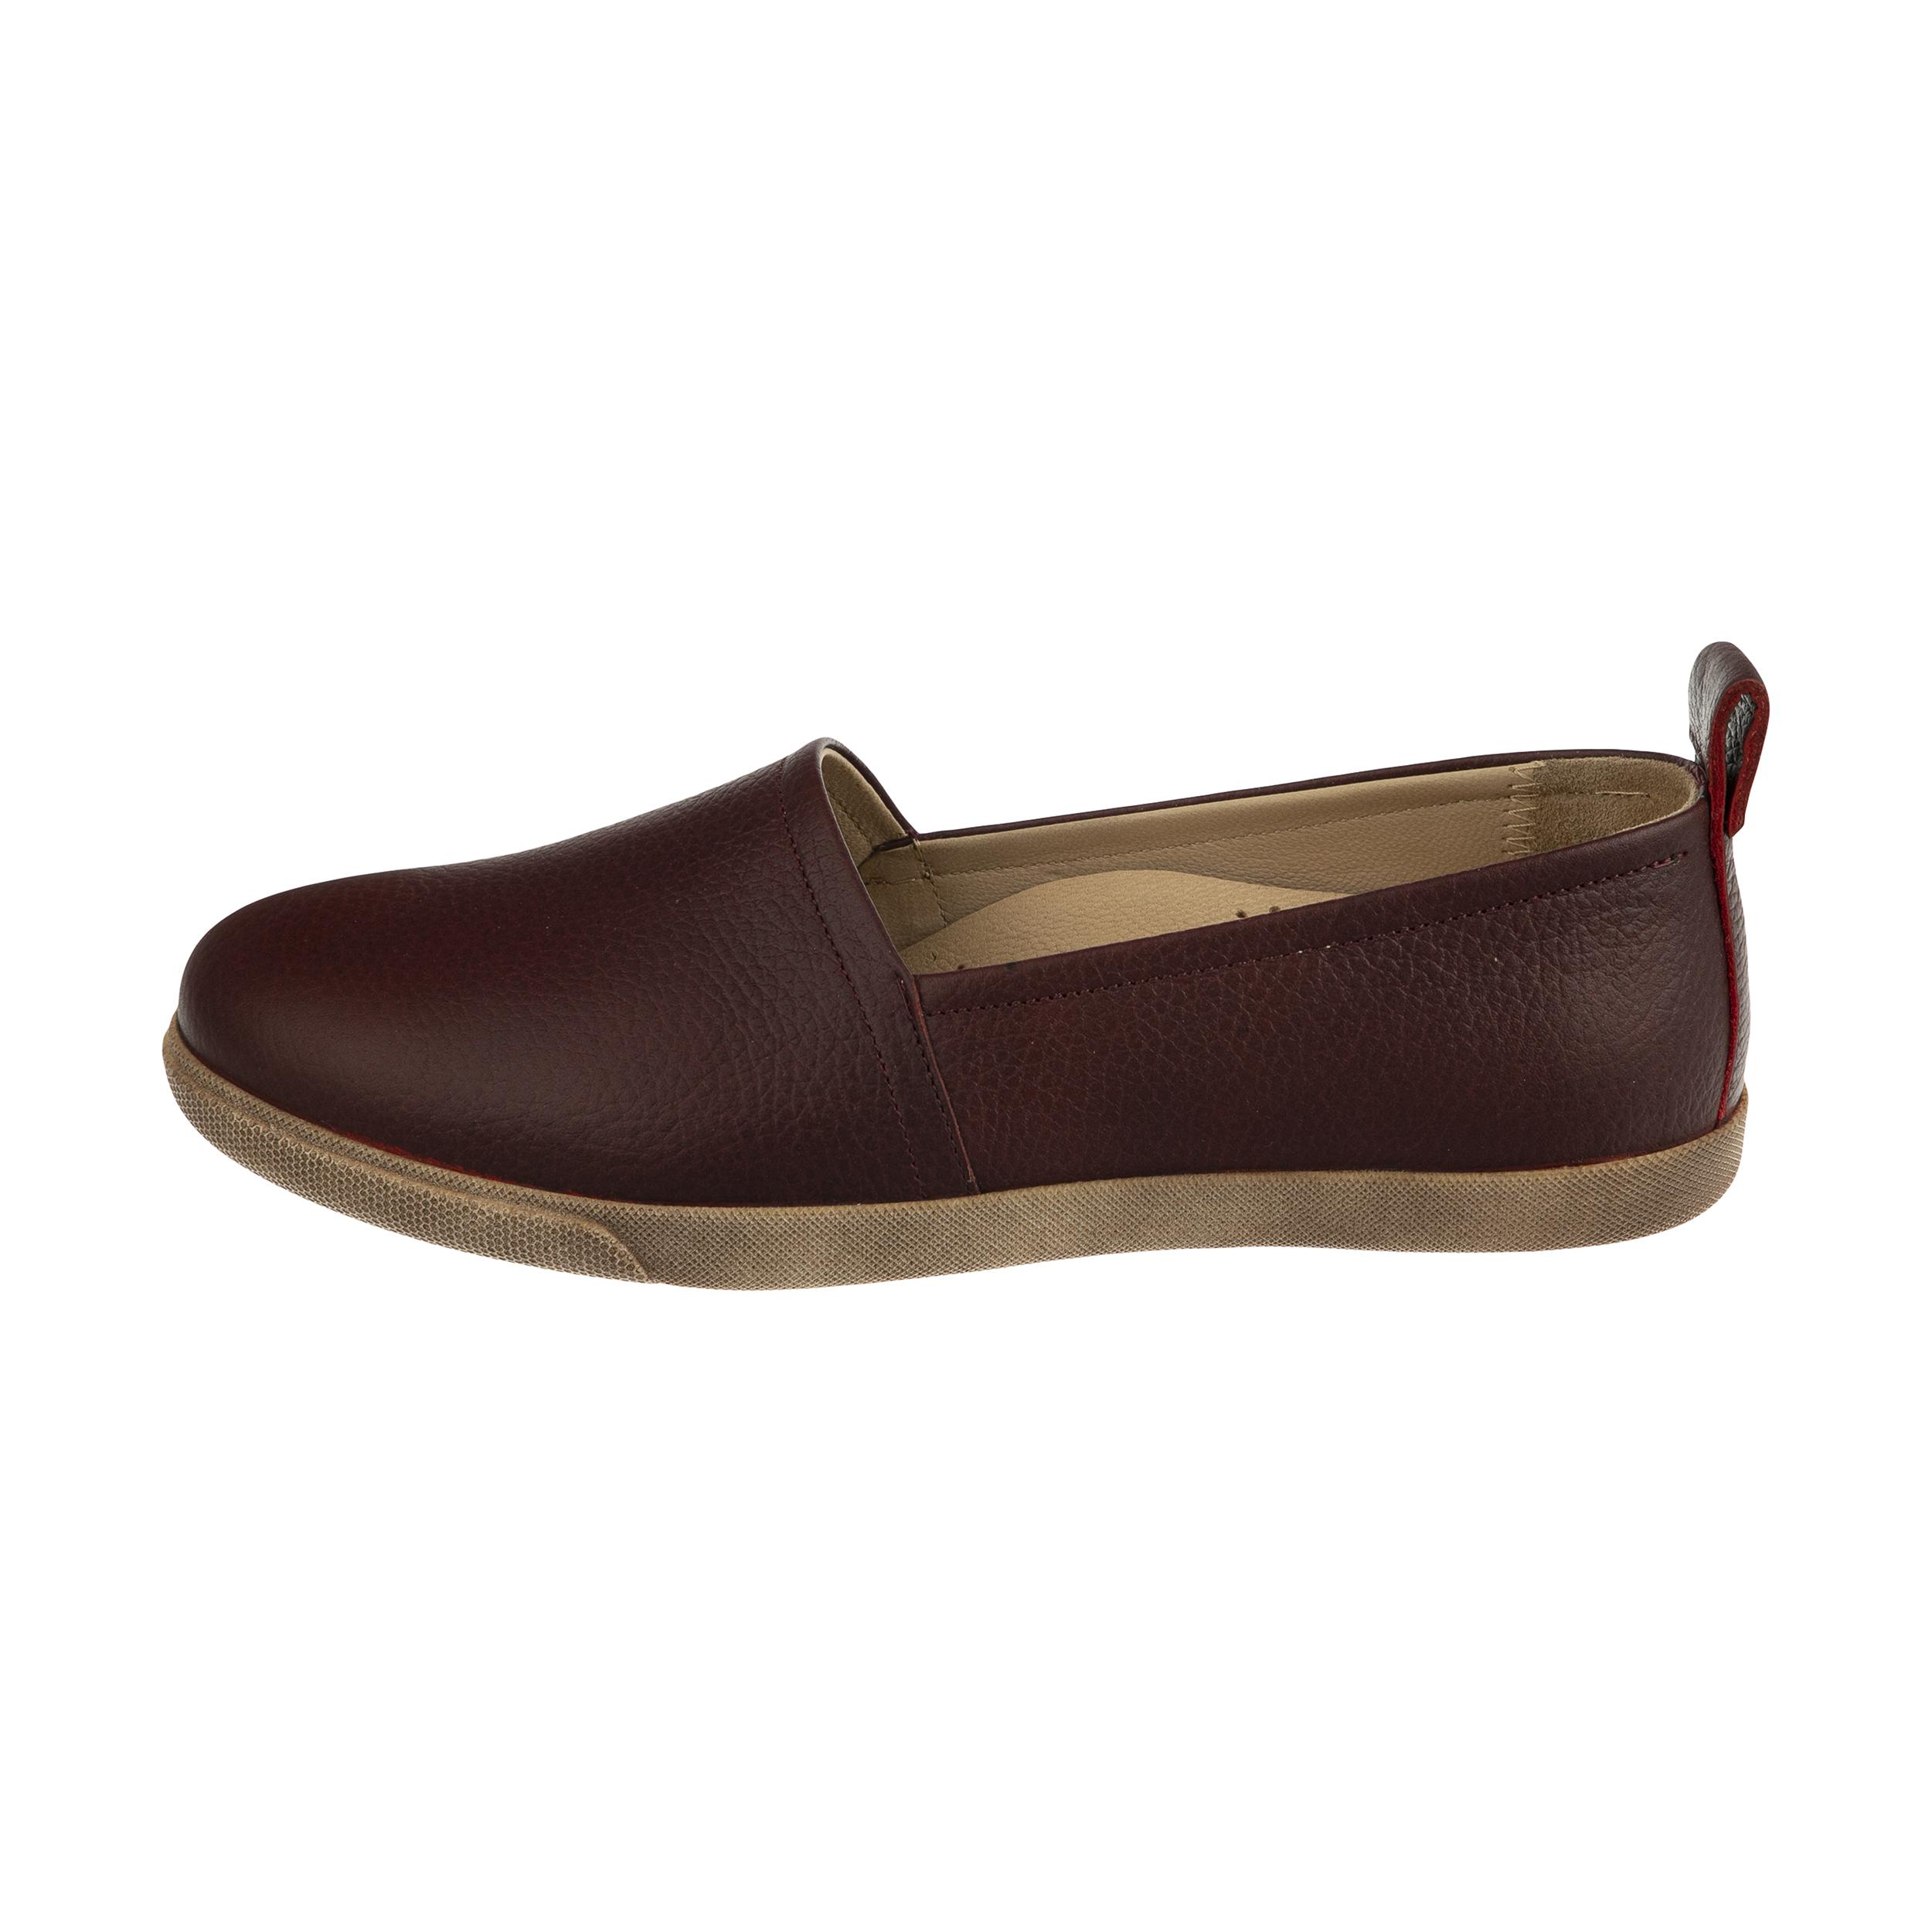 کفش روزمره زنانه برتونیکس مدل 150-B-013